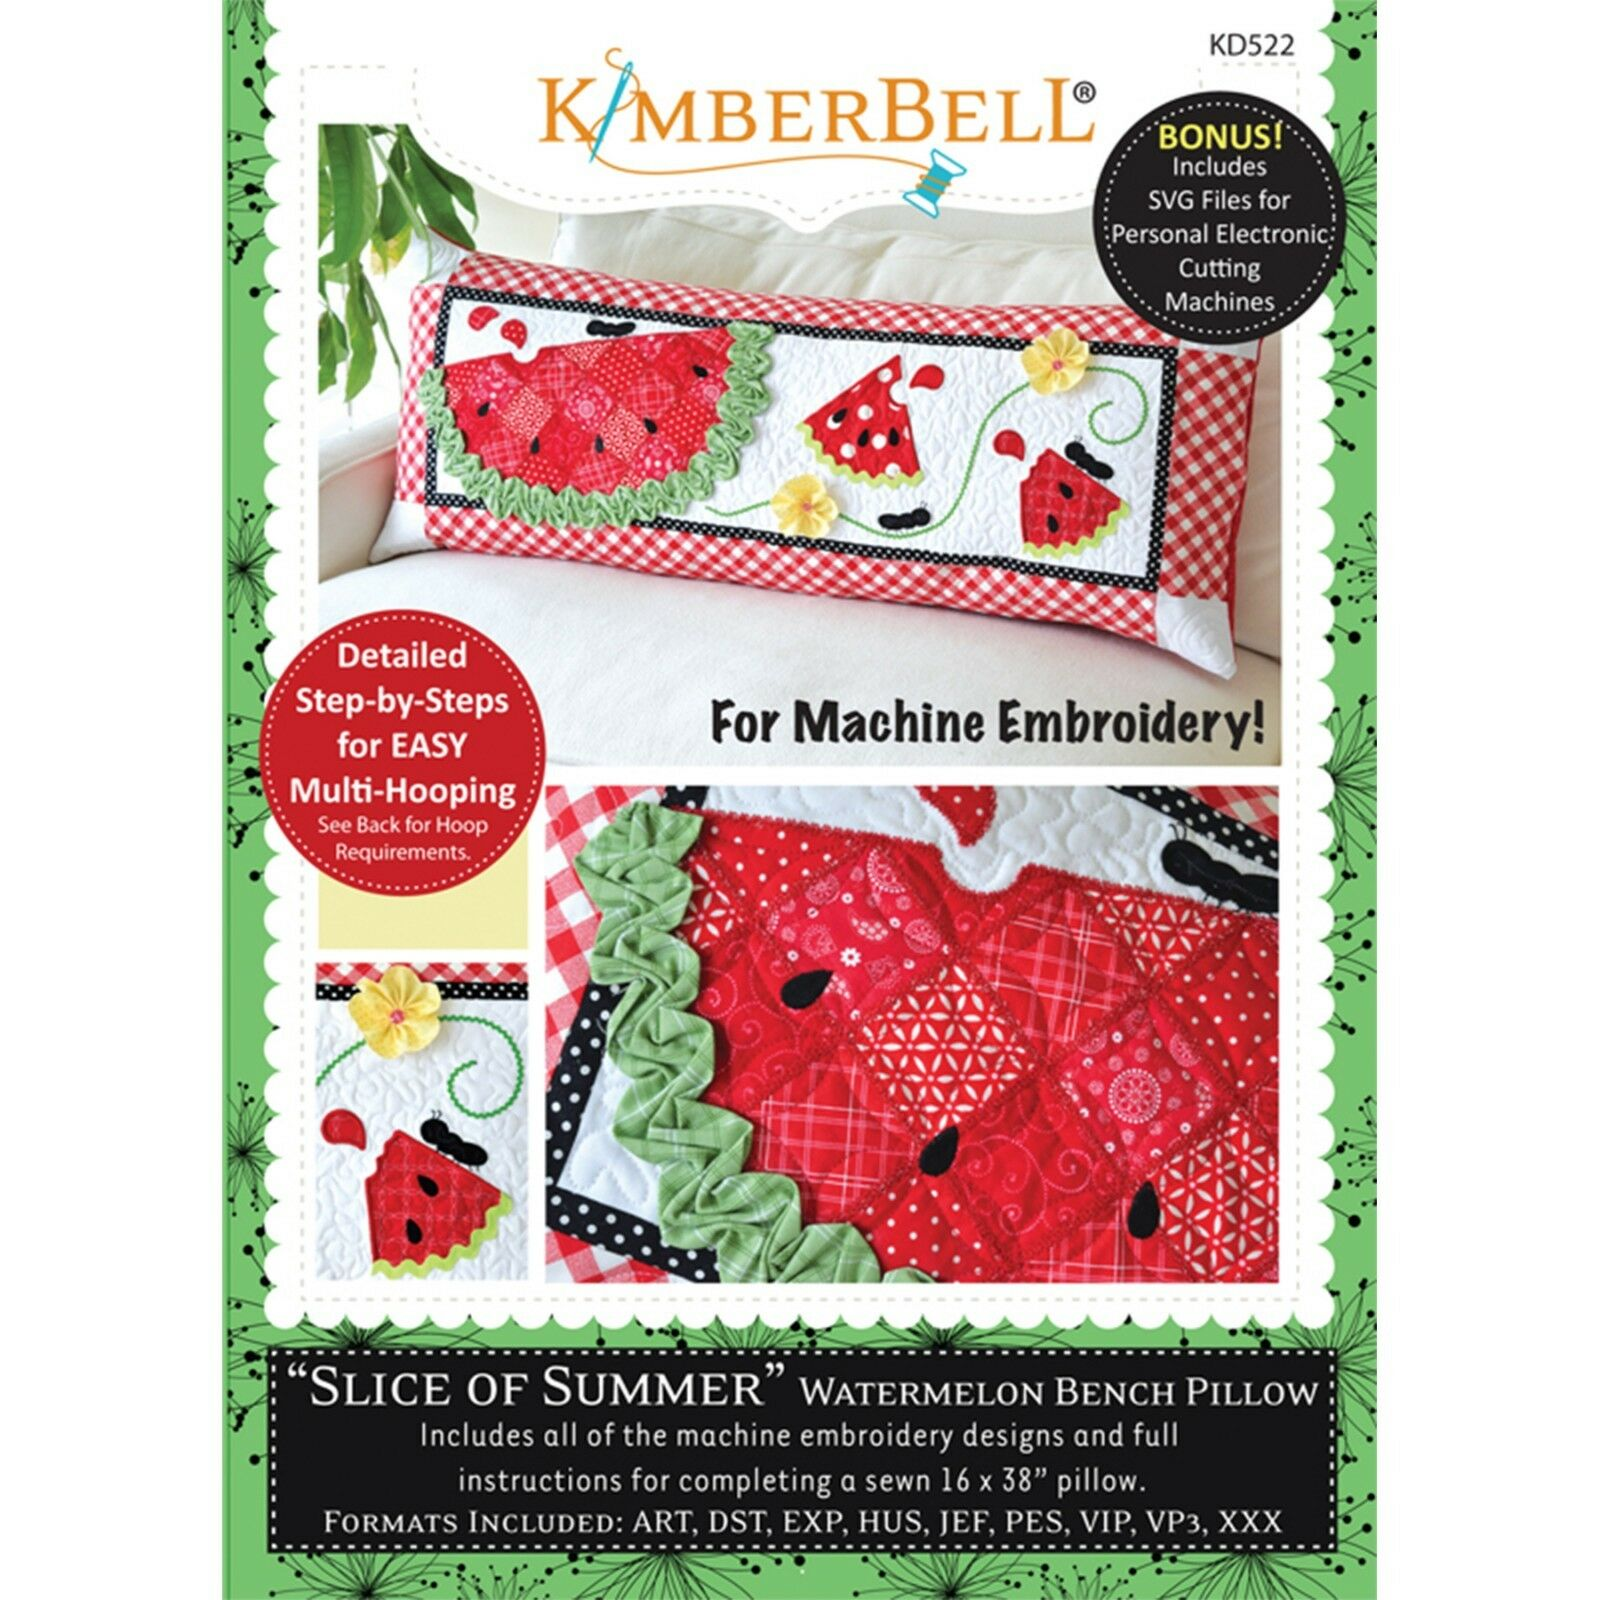 KIMBERBELLSLICE OF SUMMER WATERMELON BENCH PILLOWS (JUNE) – MACHINE EMBROIDERY